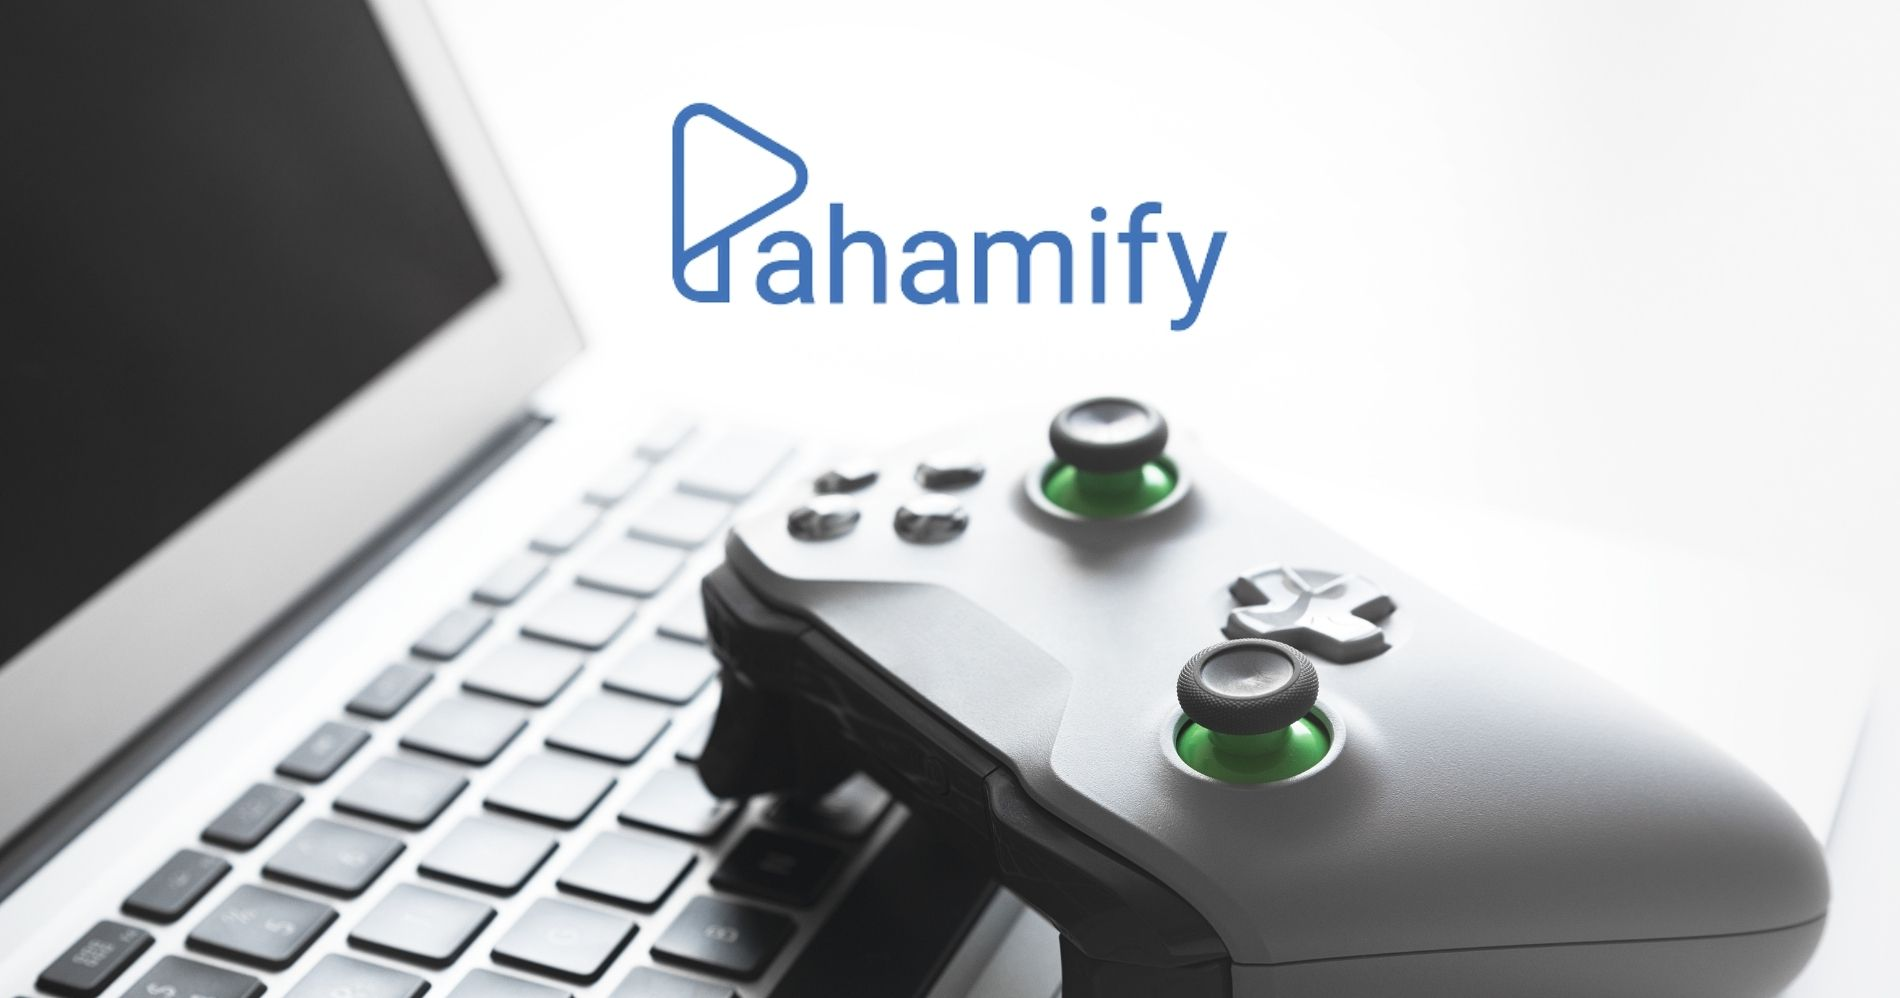 Pahamify Illustration Web Bisnis Muda - Canva